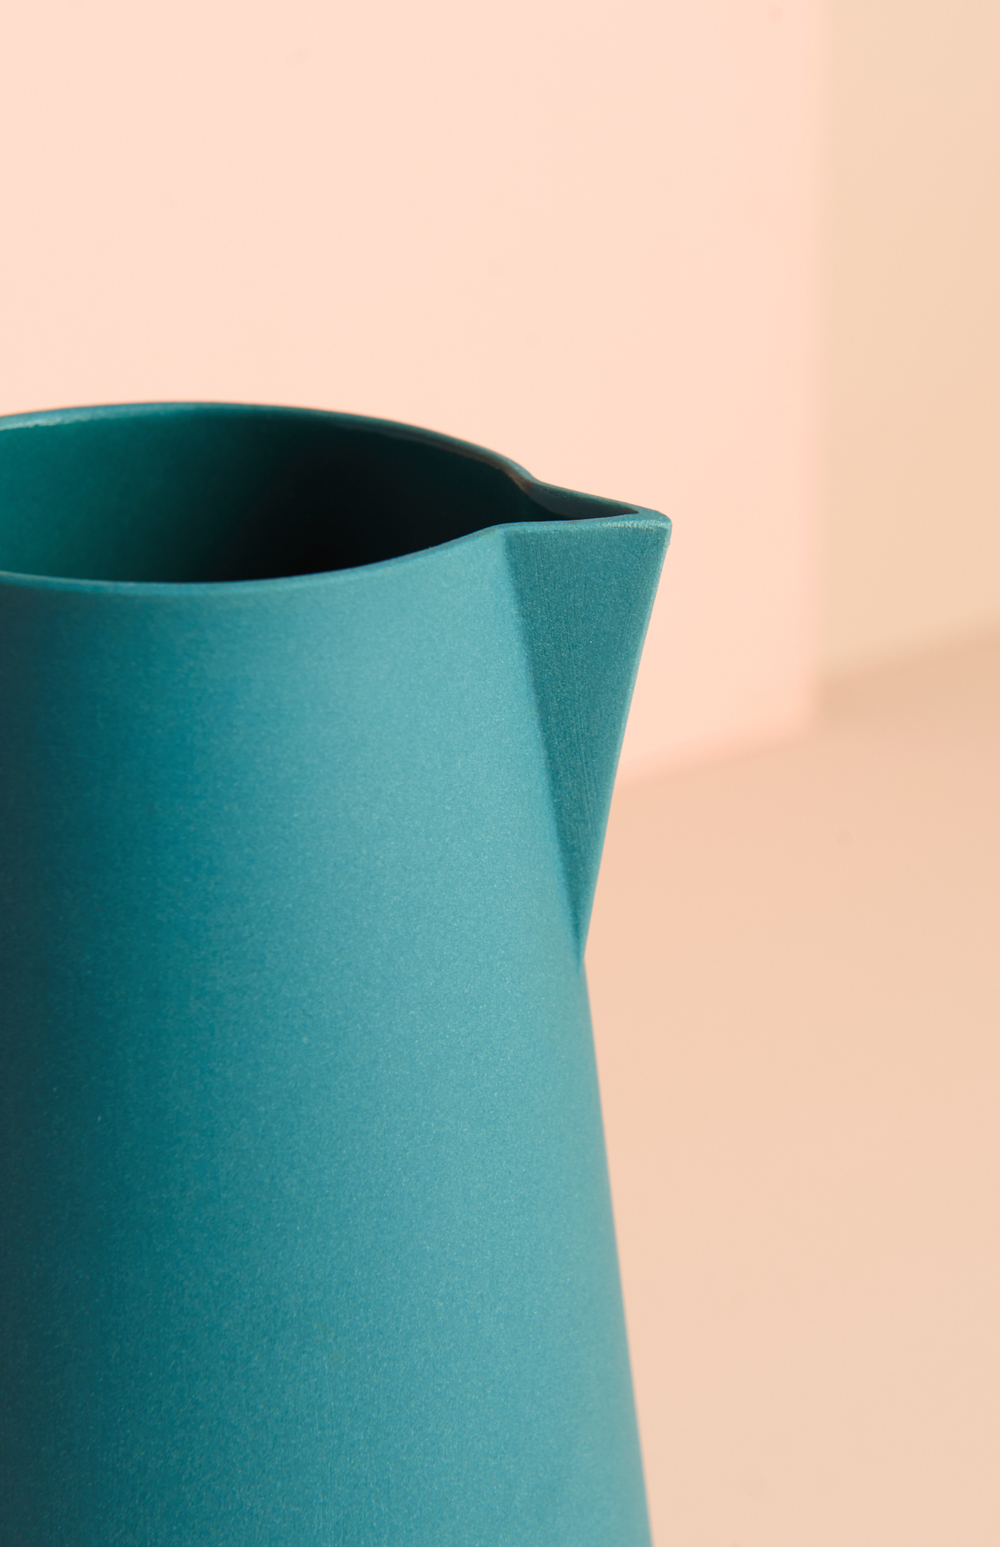 Schneid Katalog Teal Blue Ceramics